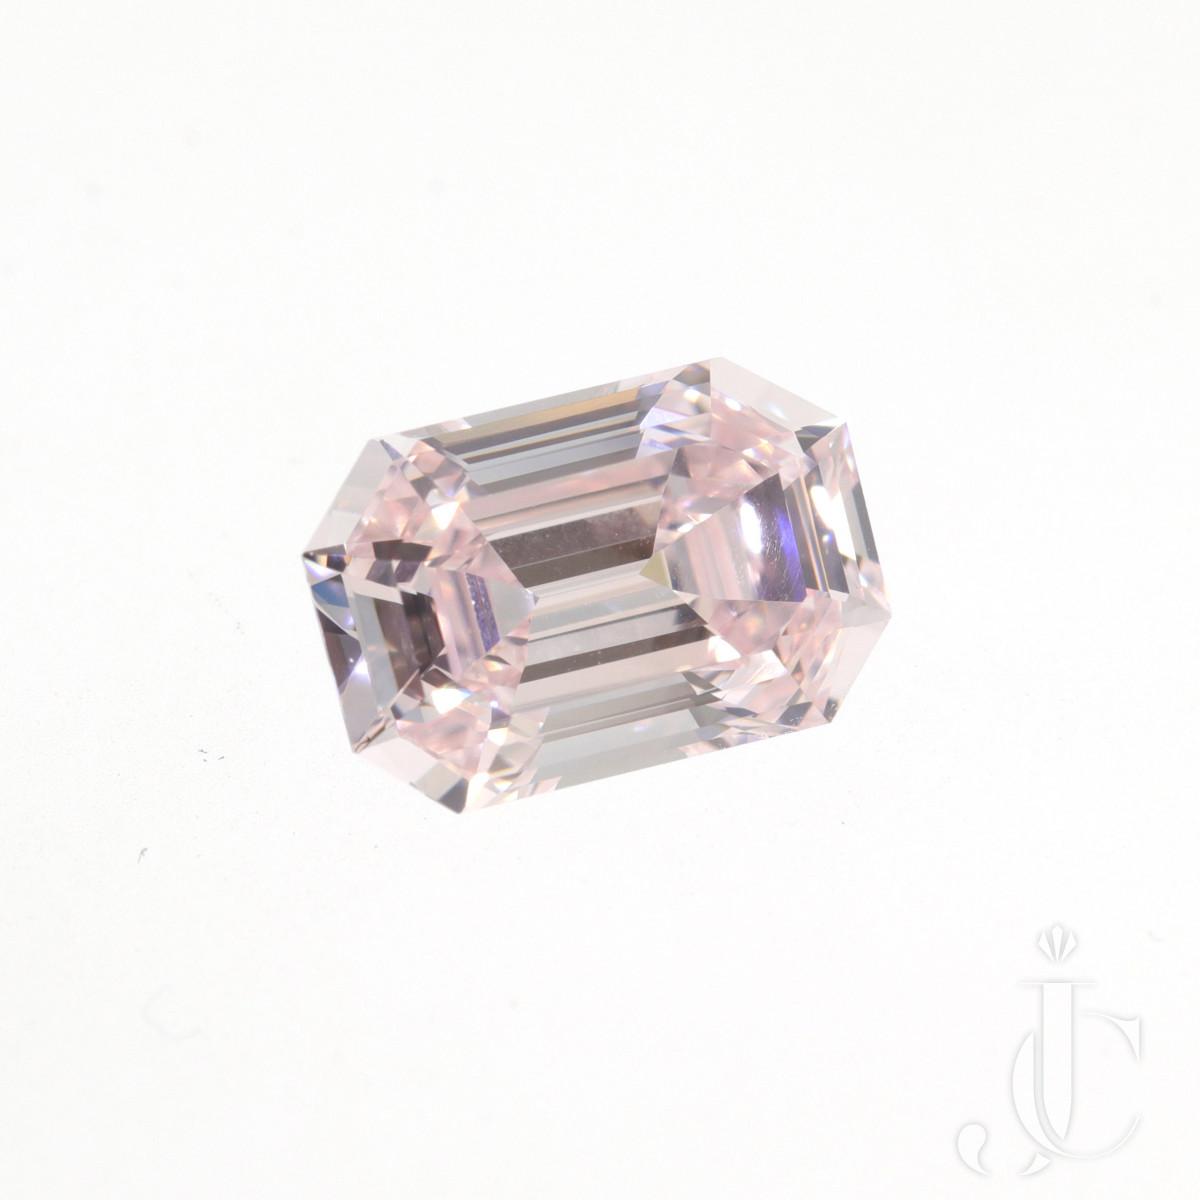 2.44 ct Light Pink emerald Cut Internally Flawless